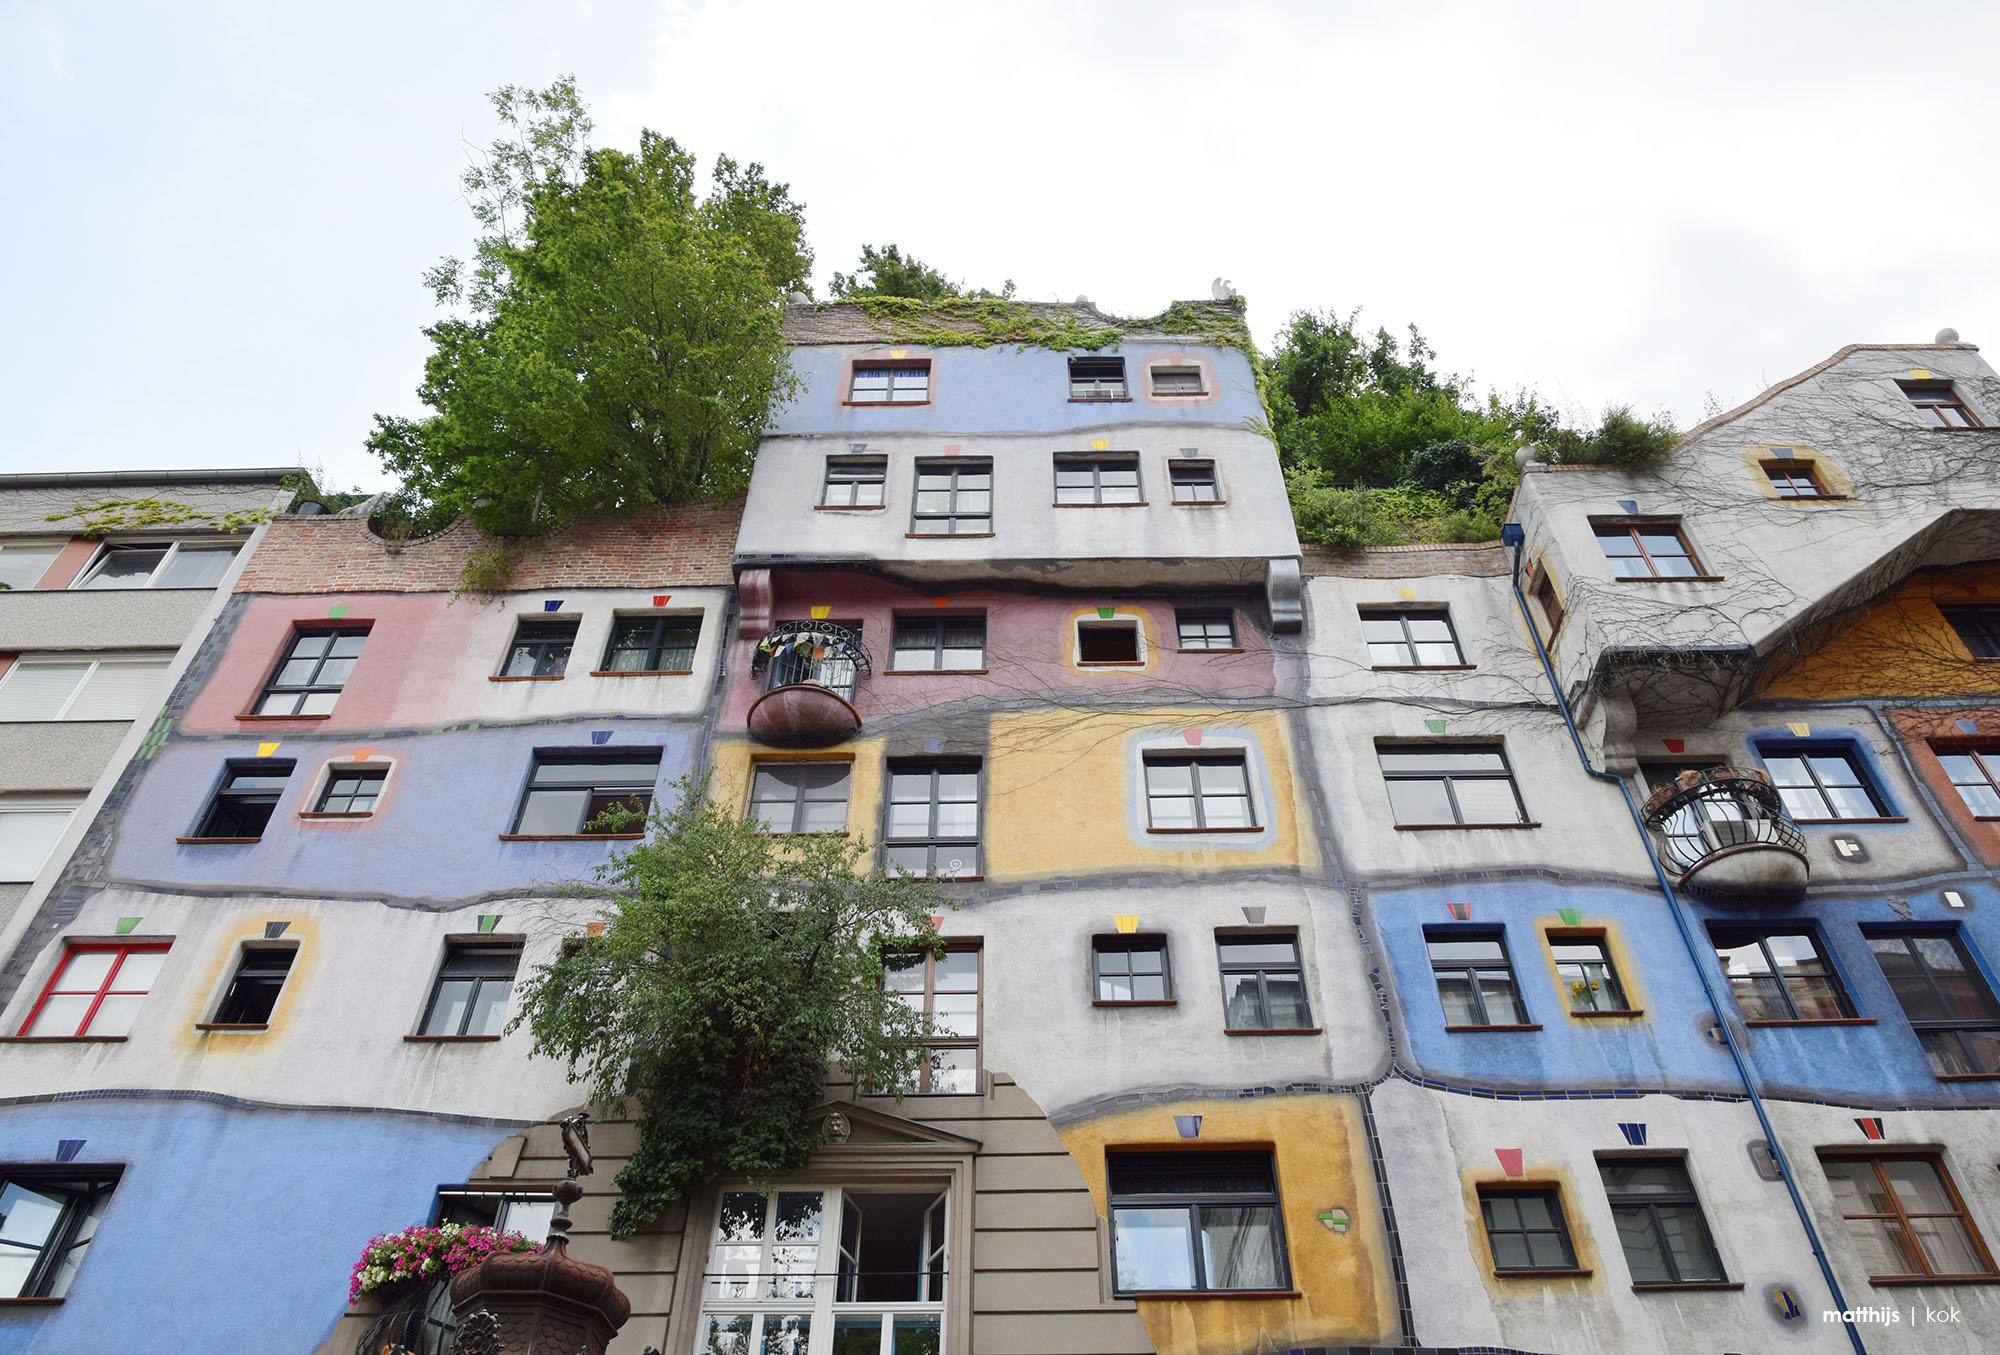 Hundertwasserhaus, Vienna, Austria | Photo by Matthijs Kok